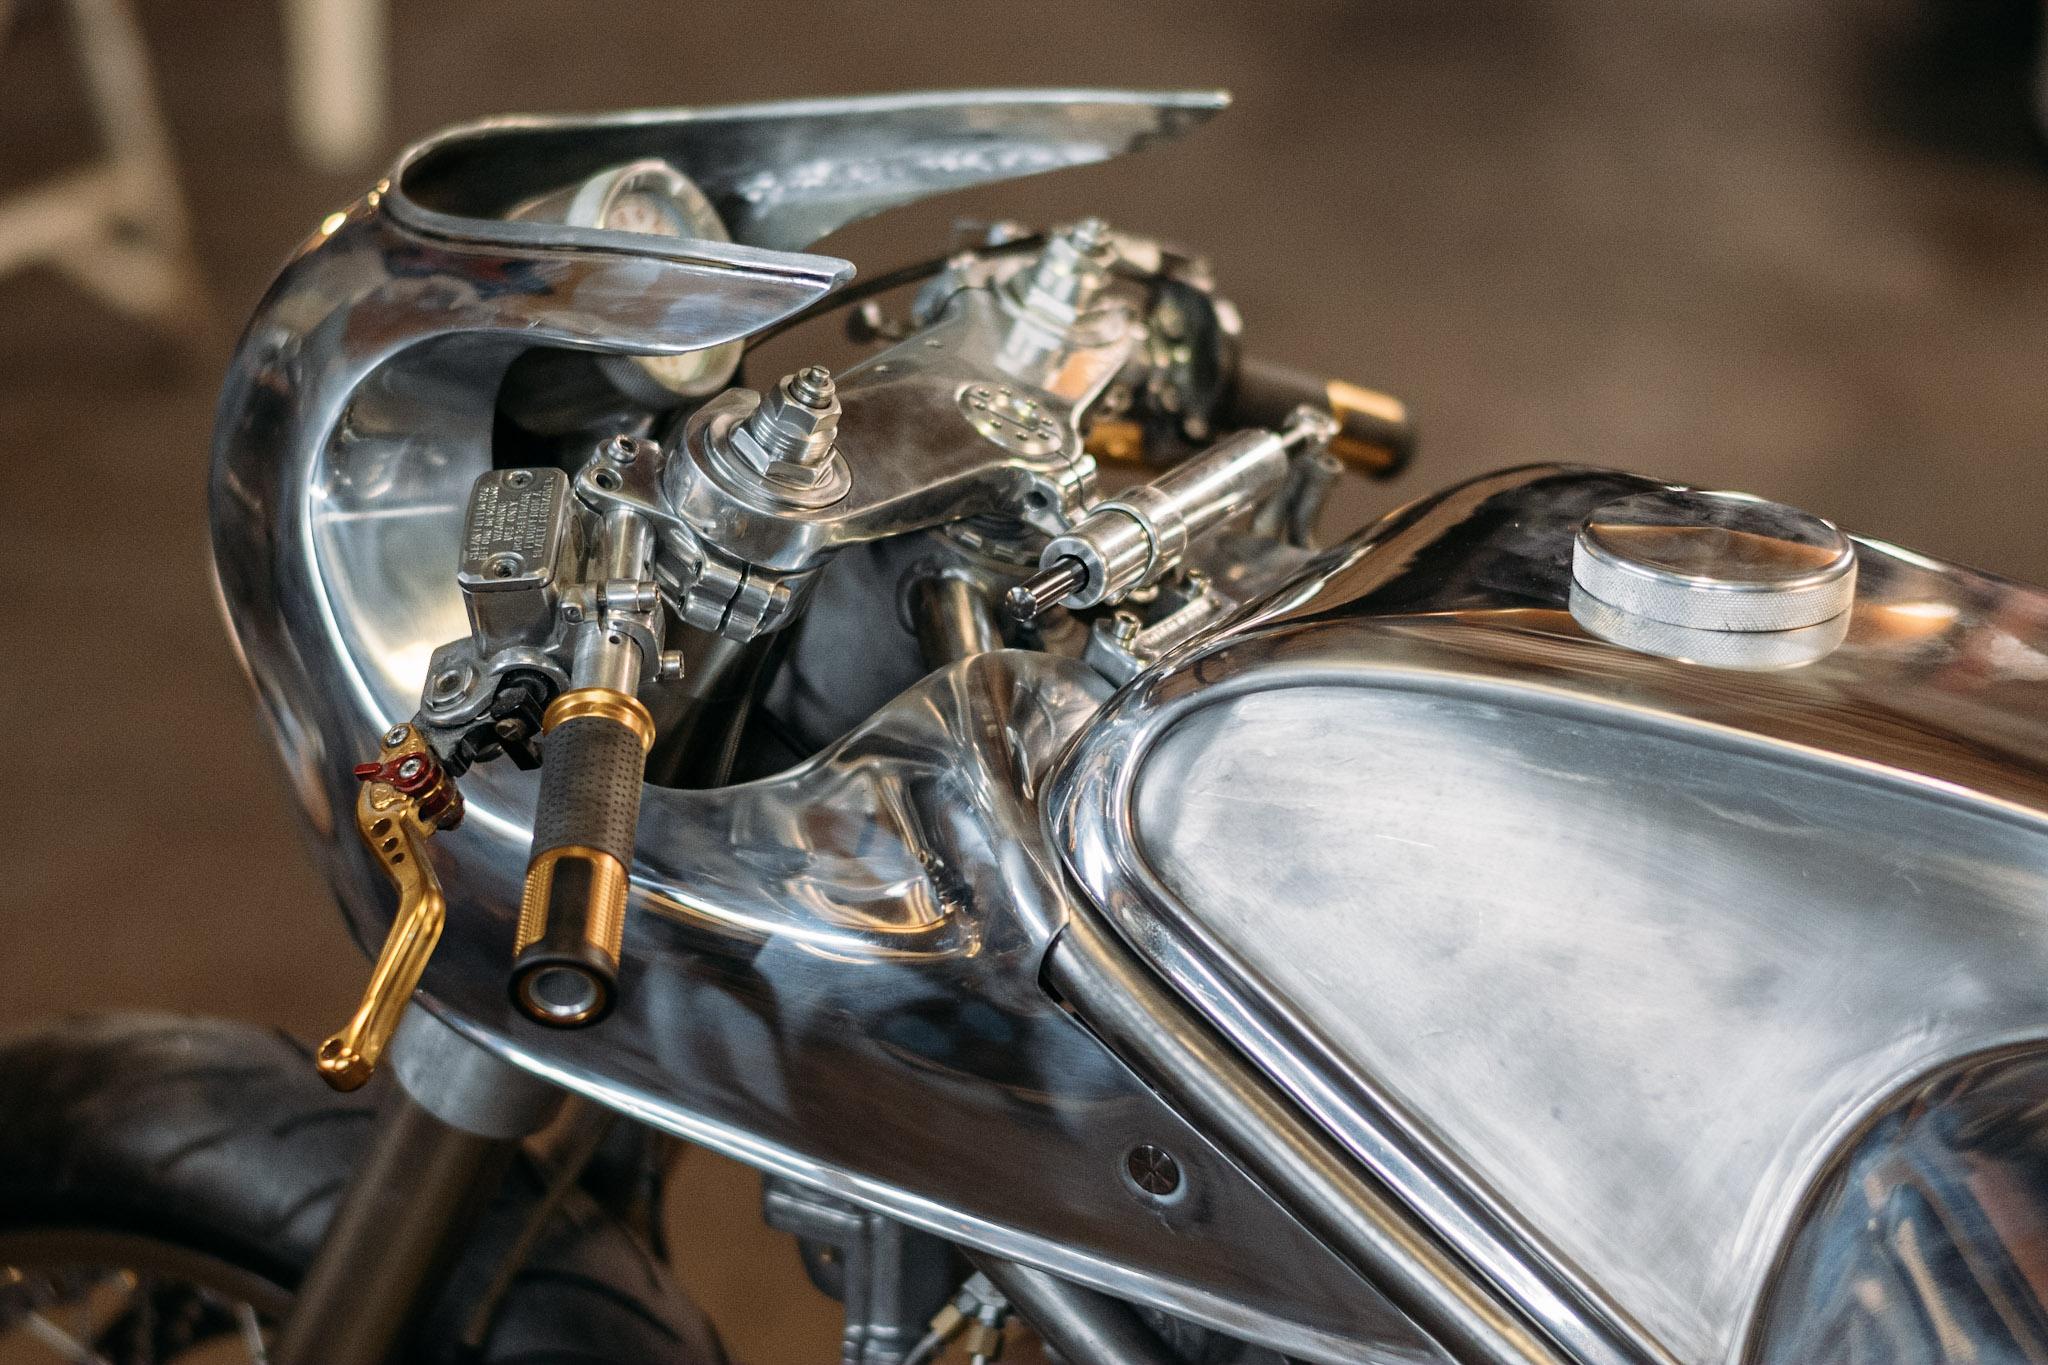 craig Rodsmith's custom supercharged Ducati